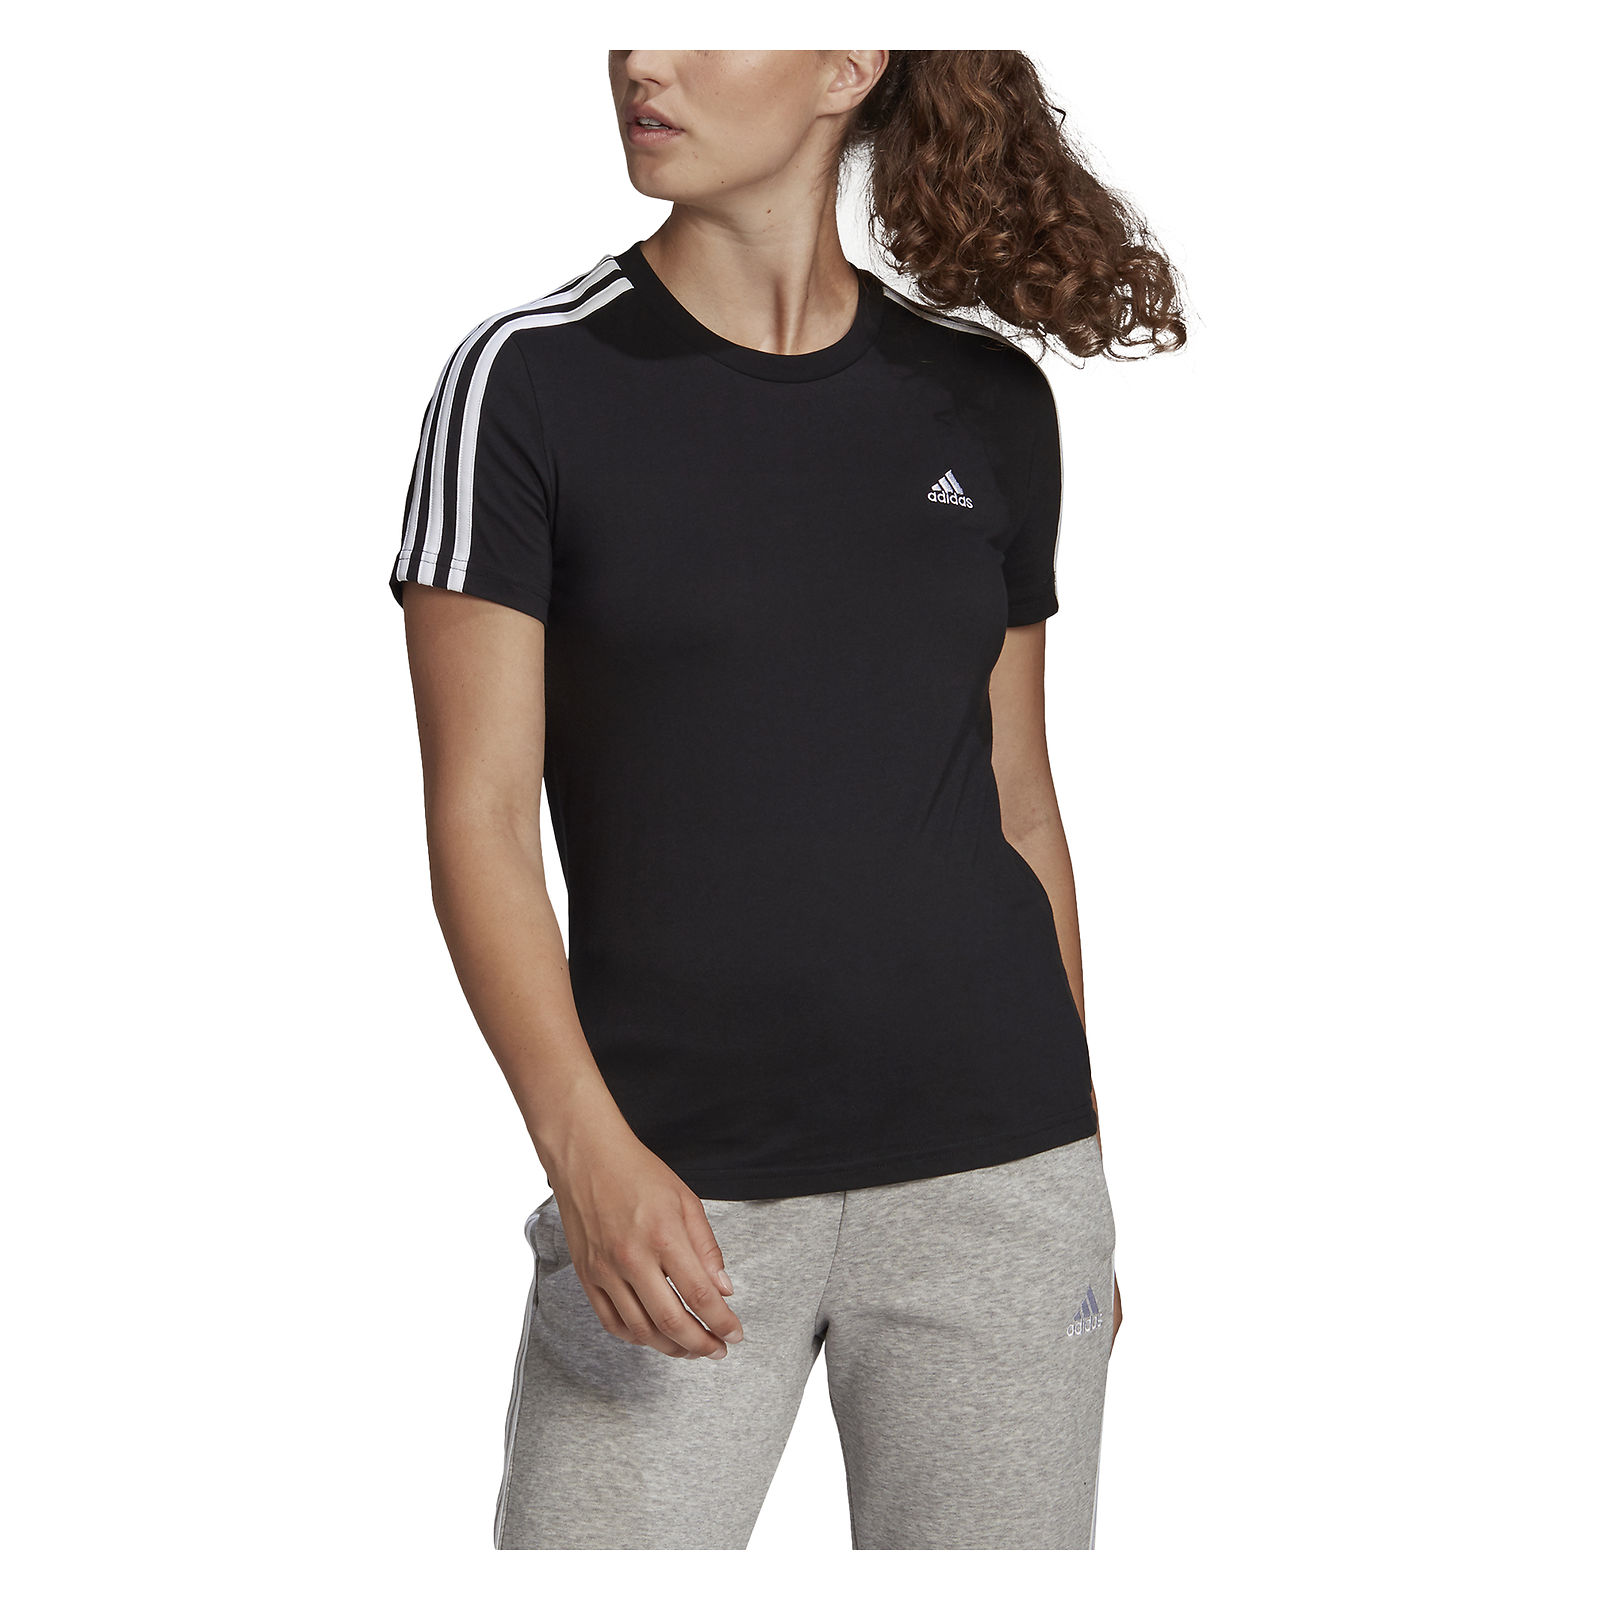 Koszulka damska adidas Loungewear Essentials Slim 3S GL0784